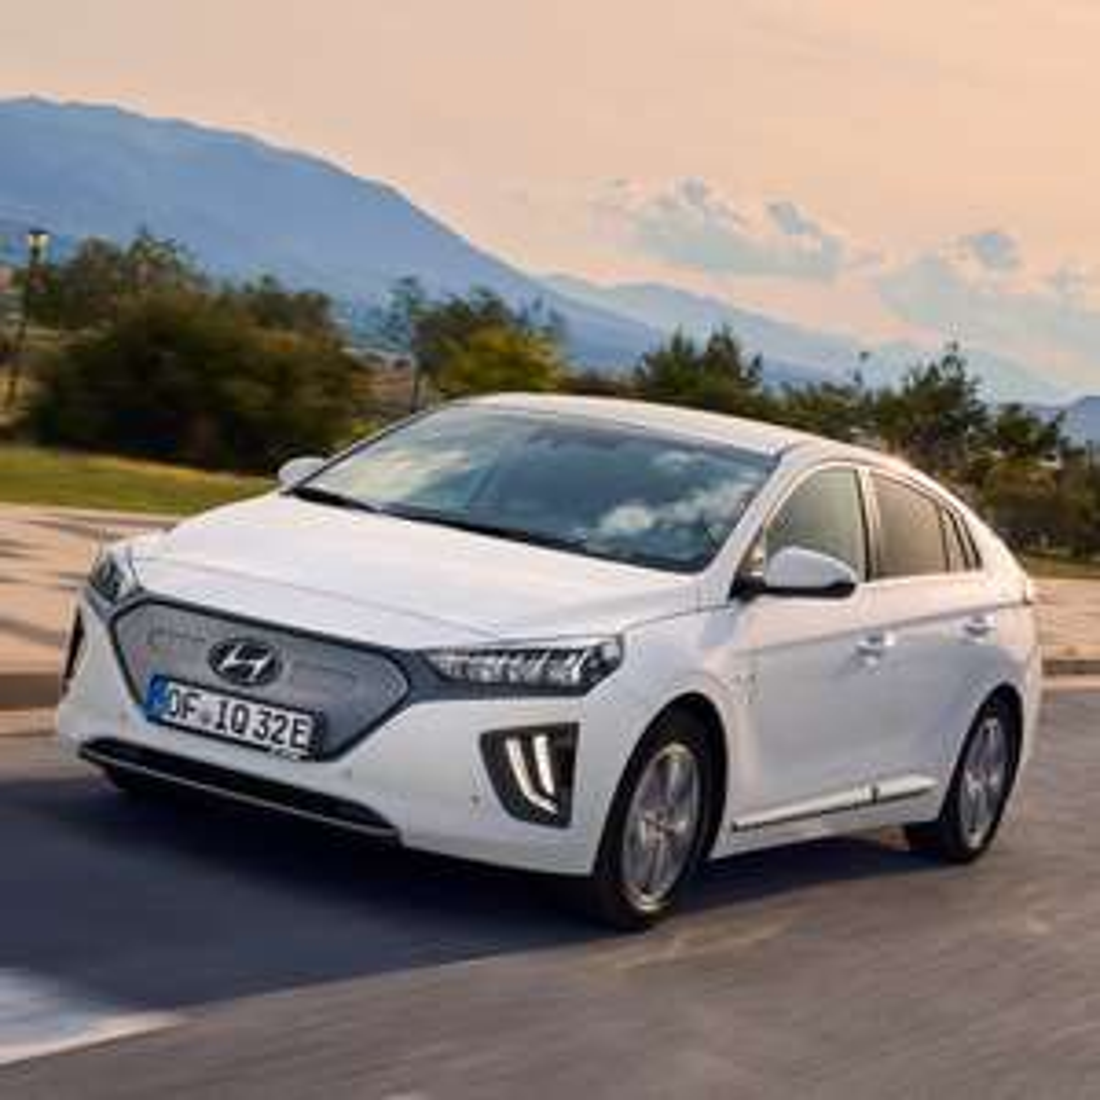 [Gewerbeleasing] Hyundai IONIQ Elektro (136 PS) mtl. 79€ + 854€ ÜF (eff. mtl. 118,71€), LF 0,26, GF 0,40, 24 Monate, BAFA, konfigurierbar